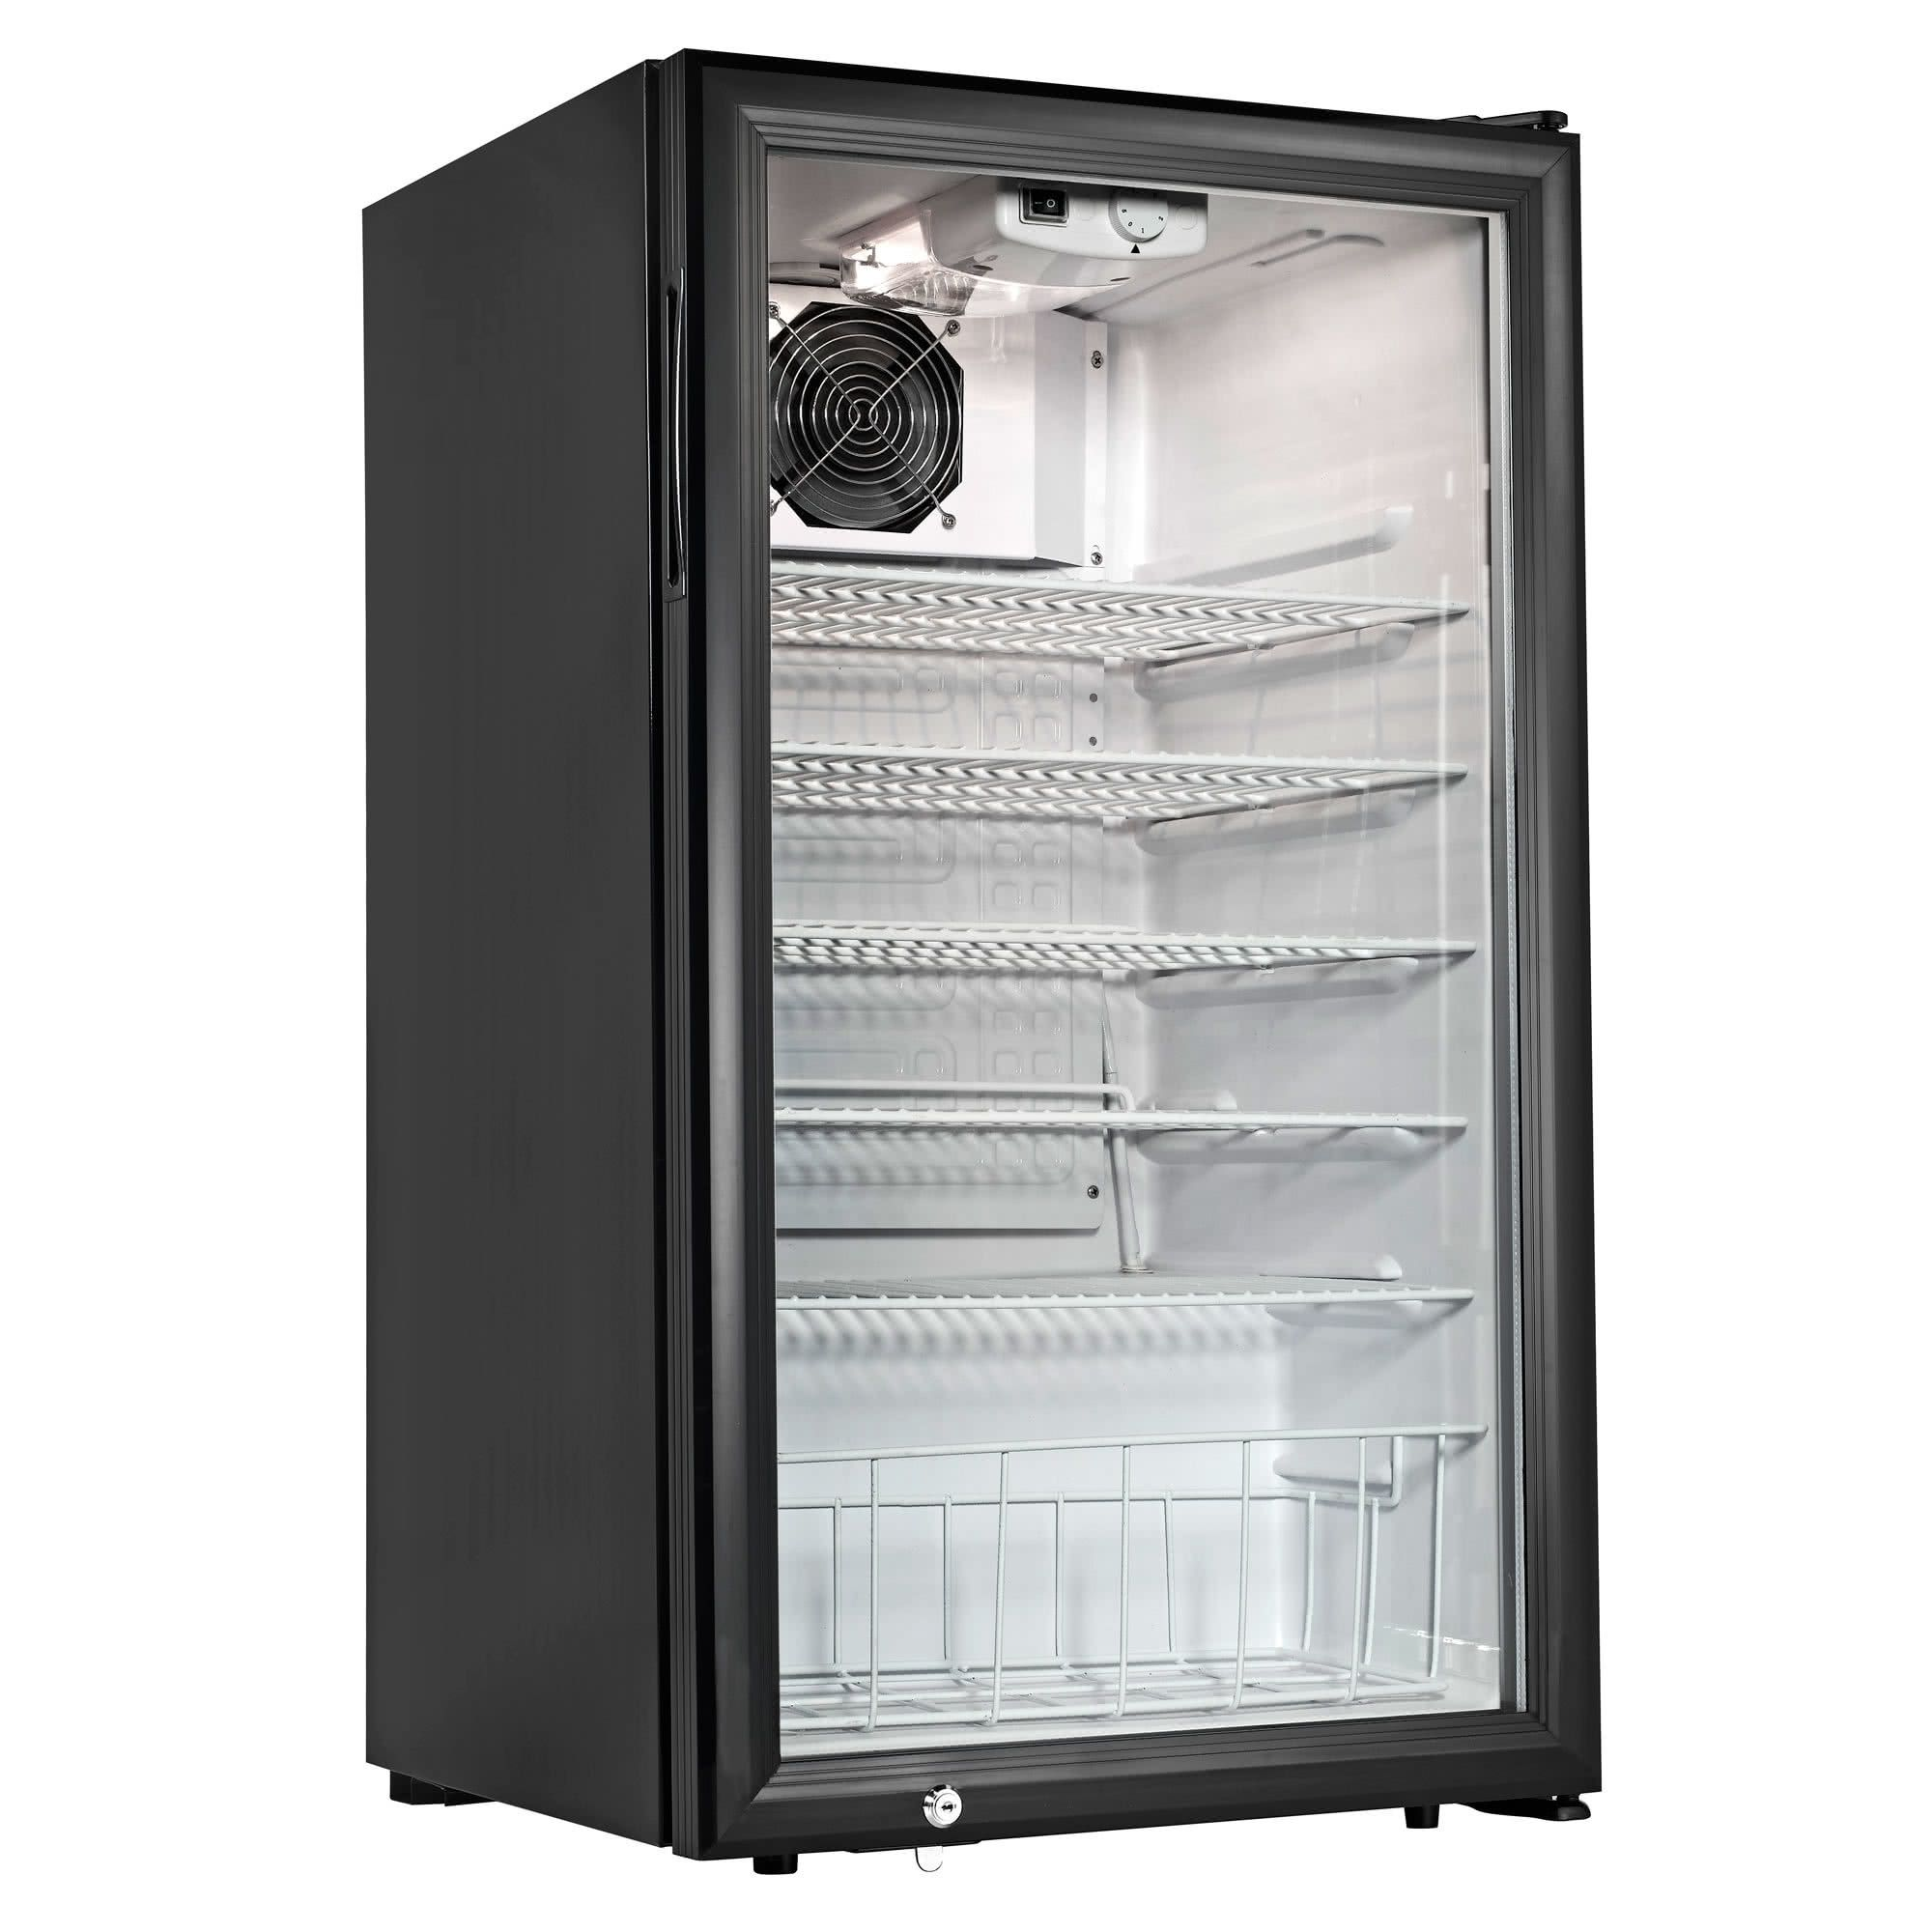 Cecilware Ctr3 75 Black Countertop Display Refrigerator With Swing